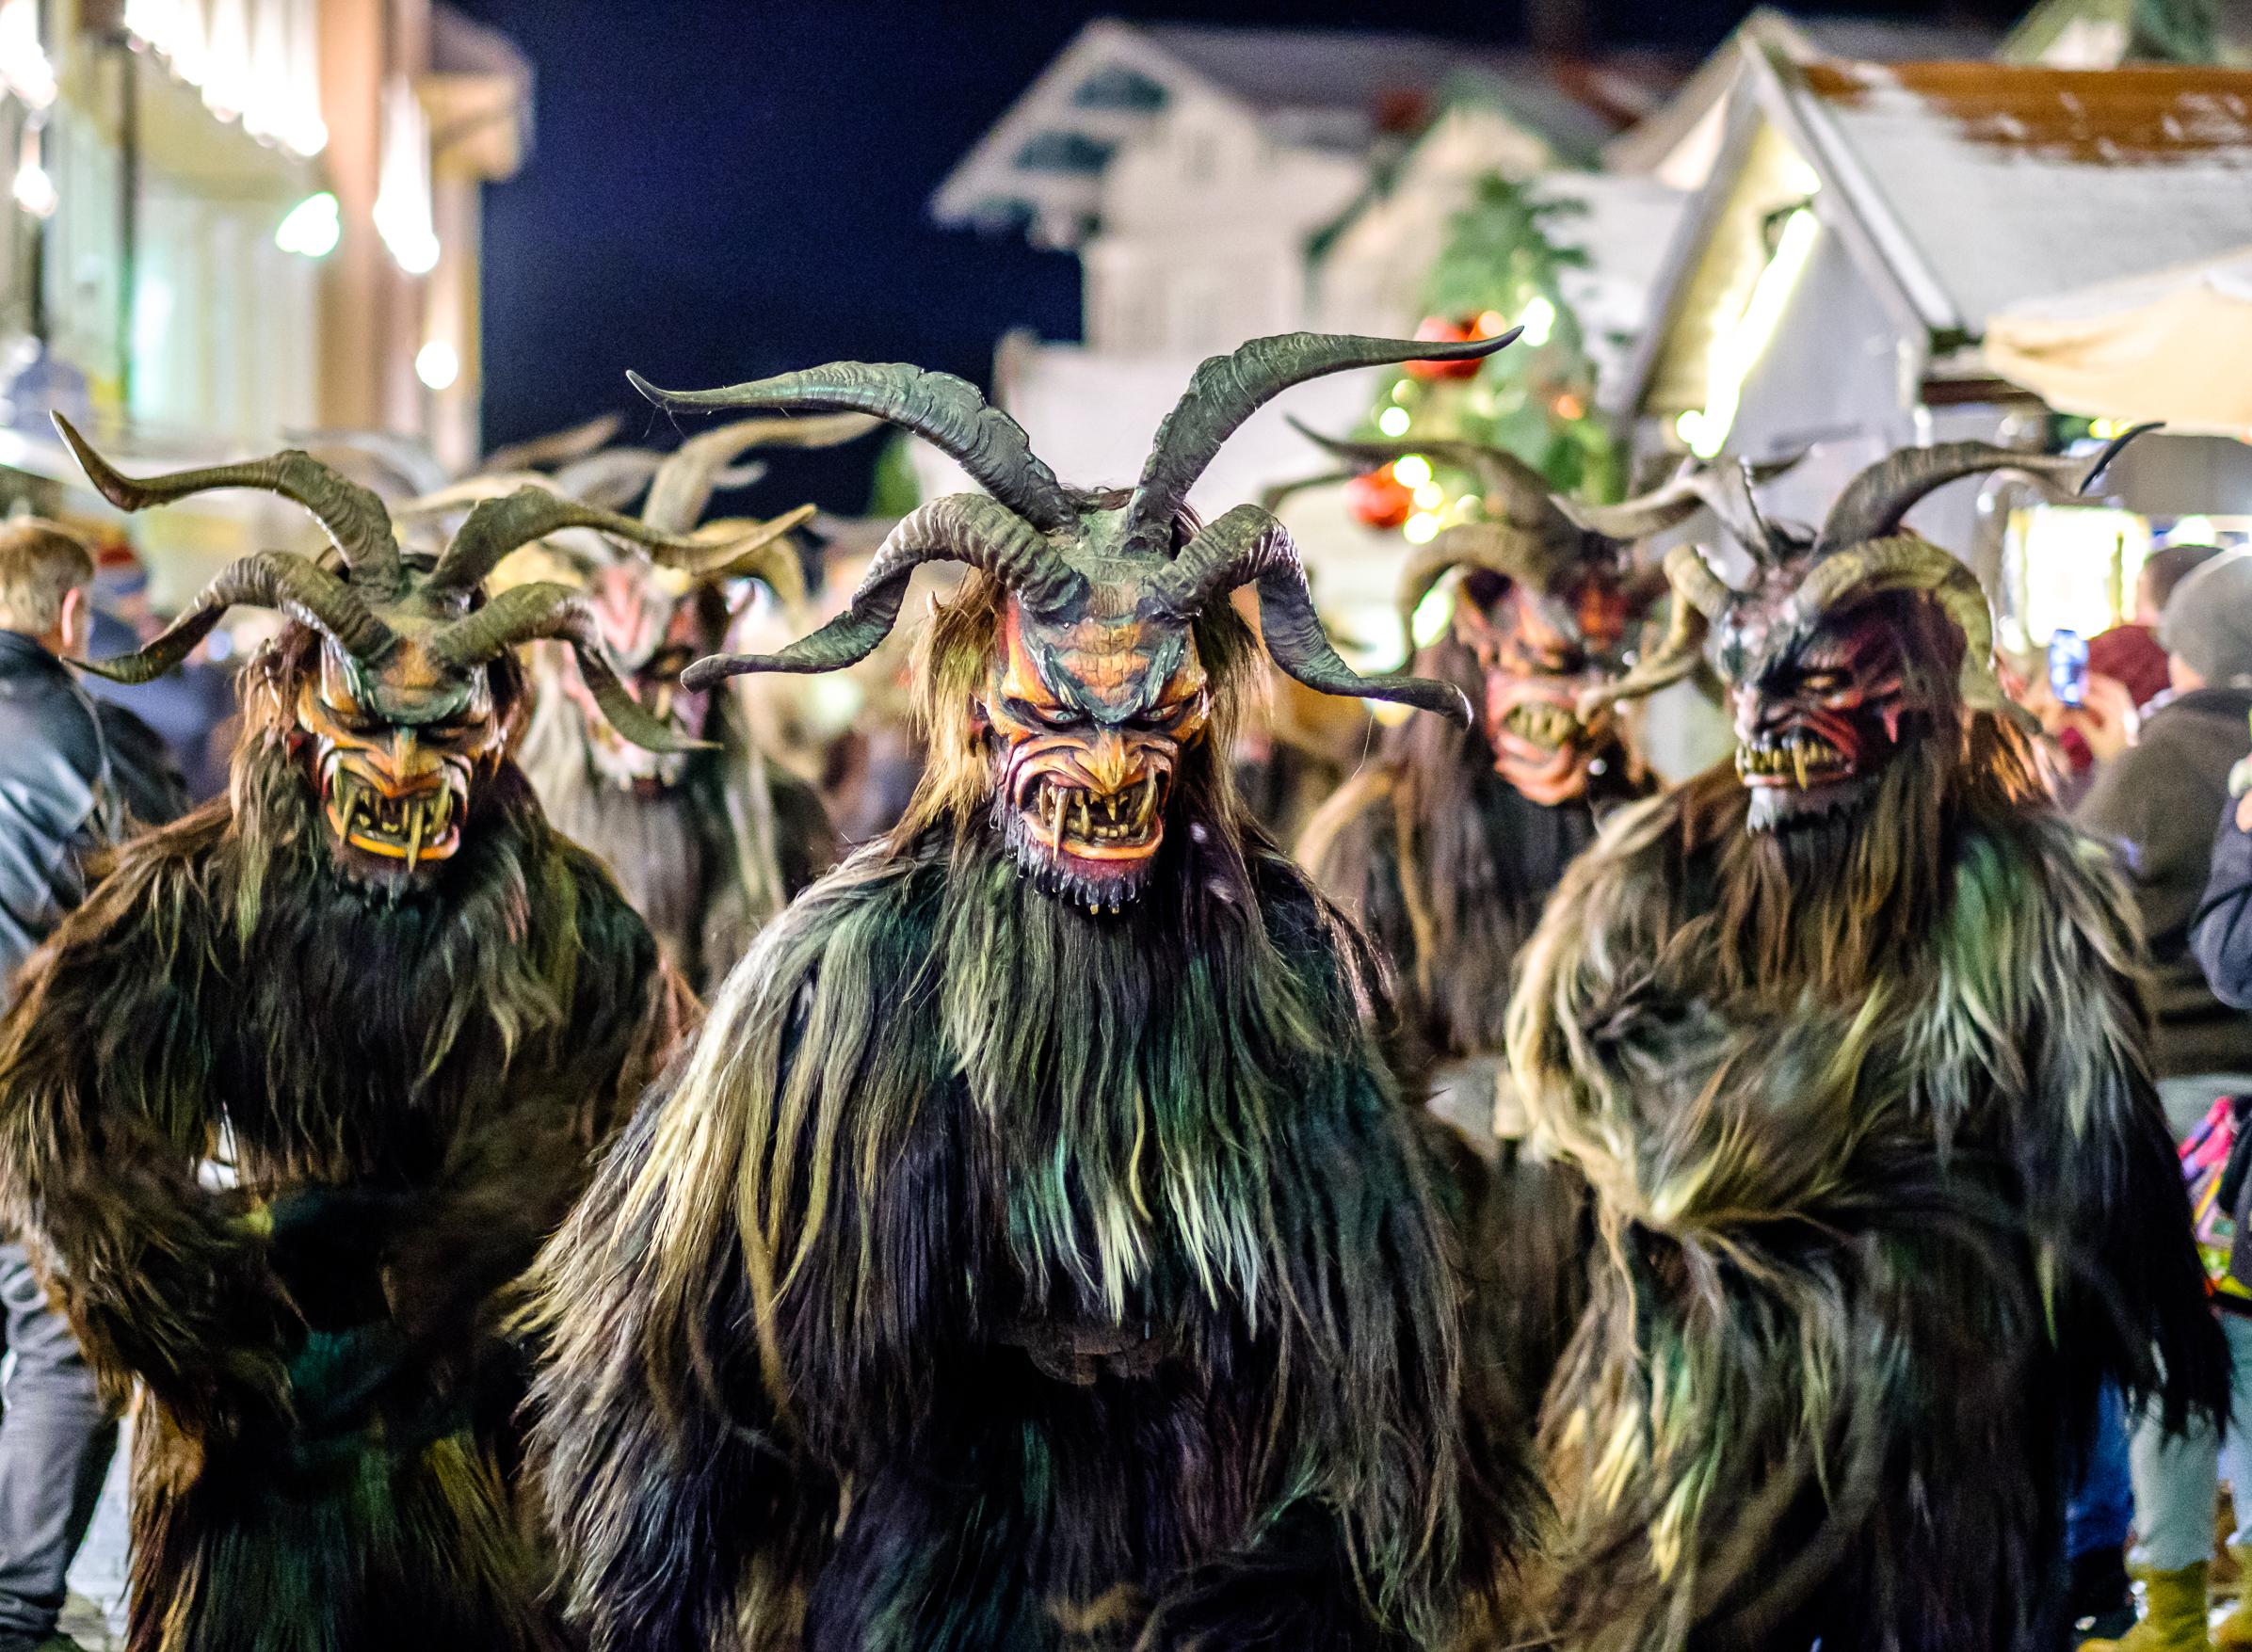 krampus parade at night in Germany